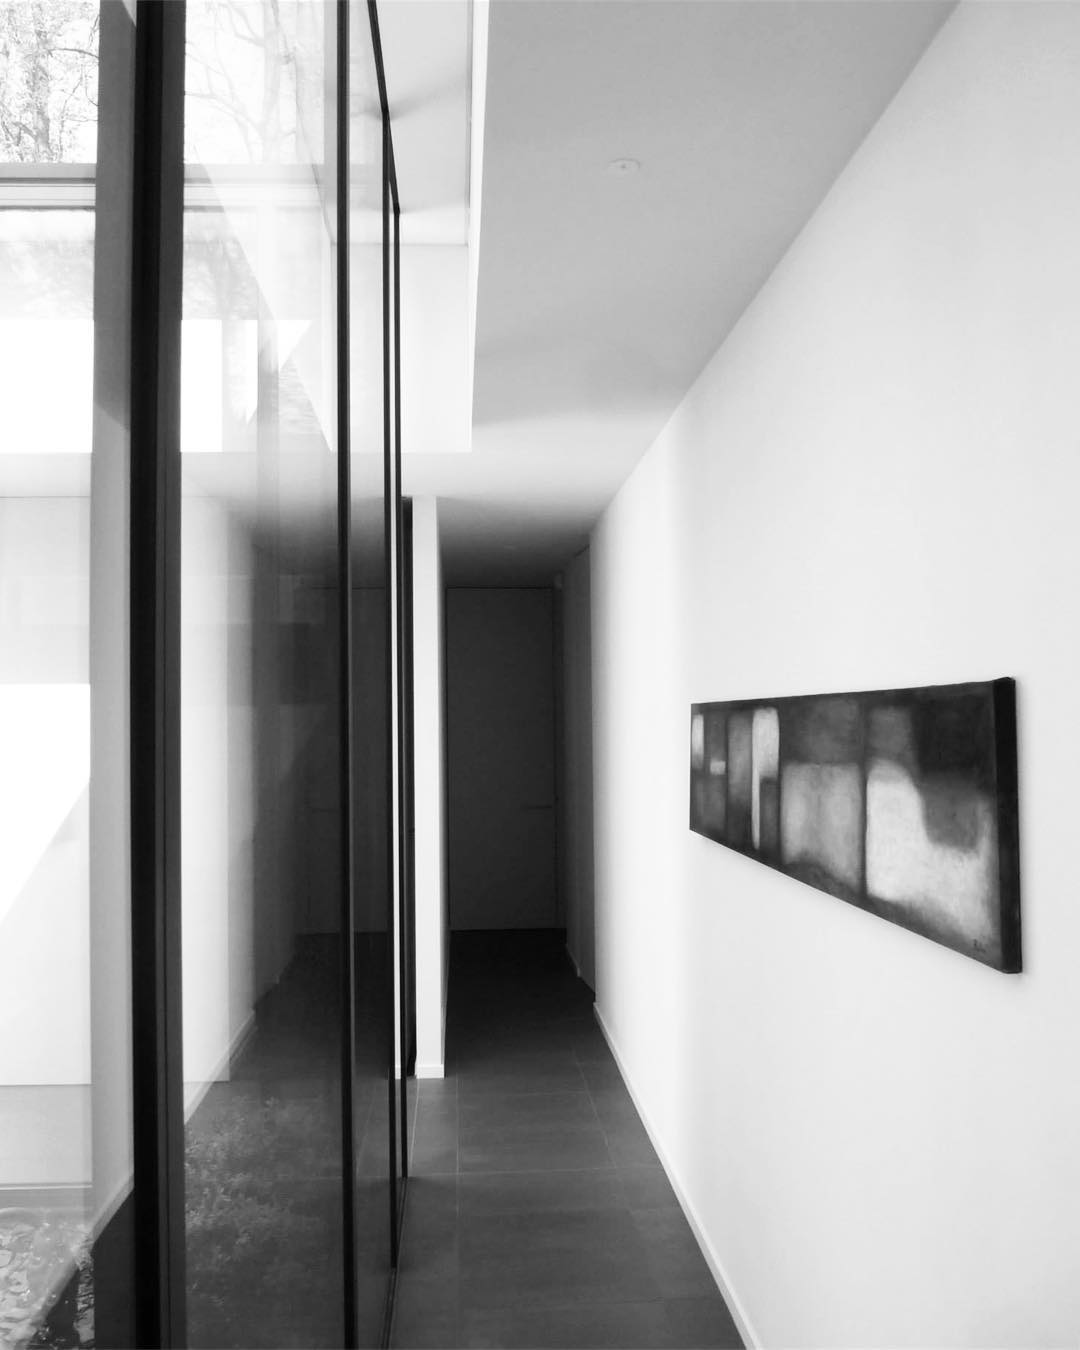 2018 02 28 BfuymykFbal 1724538275287643813 | Baeyens & Beck architecten Gent | architect nieuwbouw renovatie interieur | high end | architectenbureau